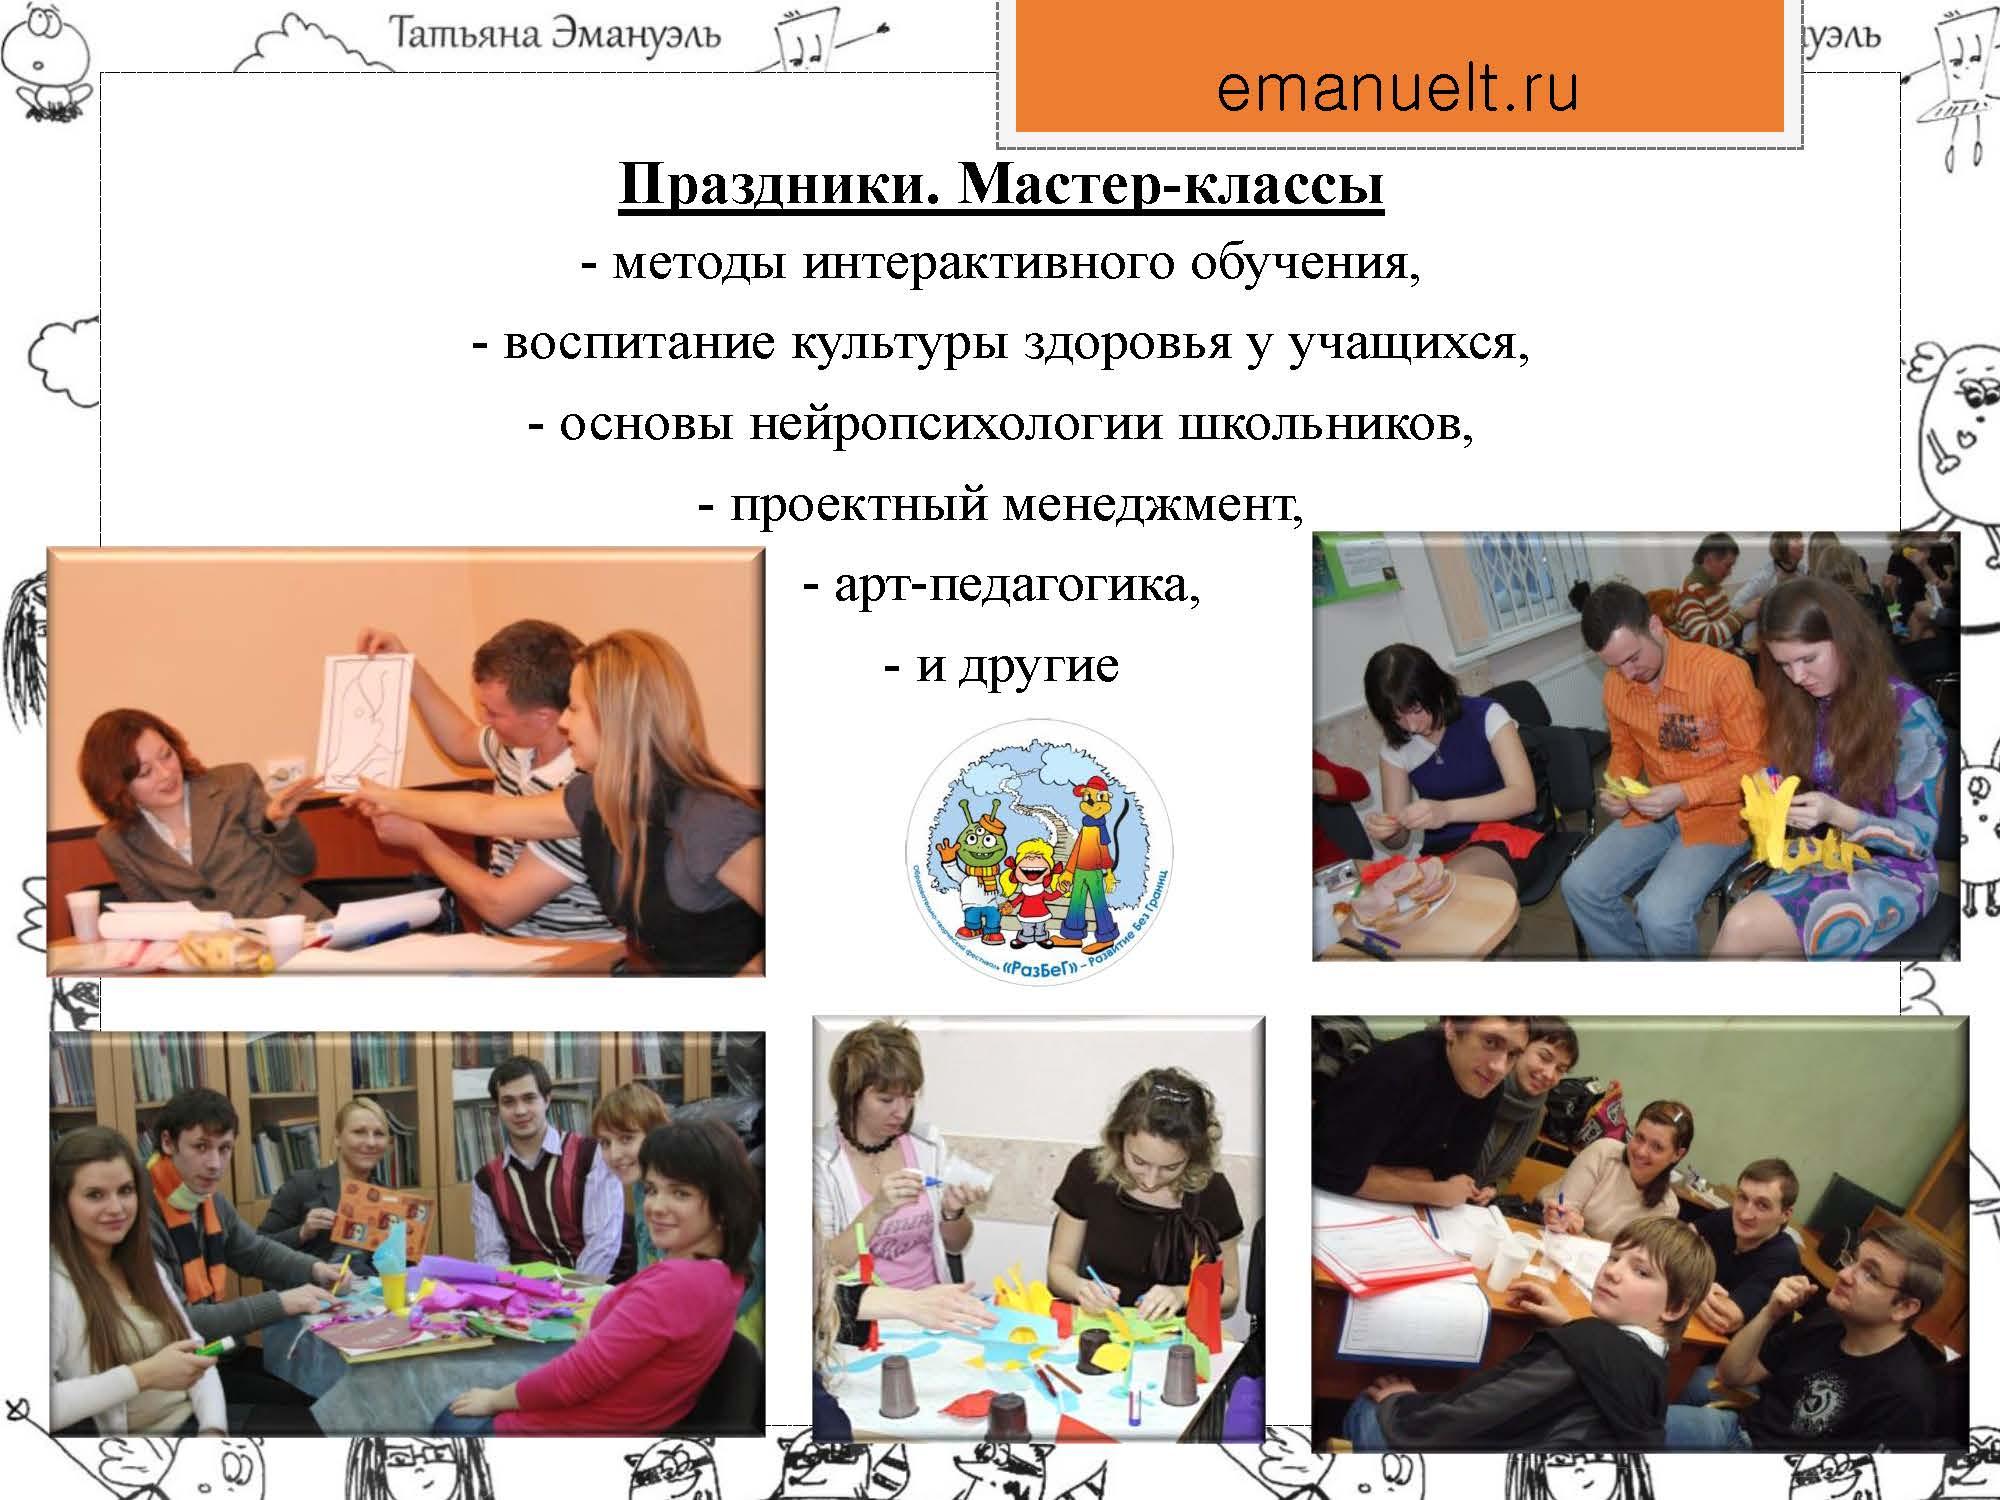 RazBeG_Emanuel_Страница_29